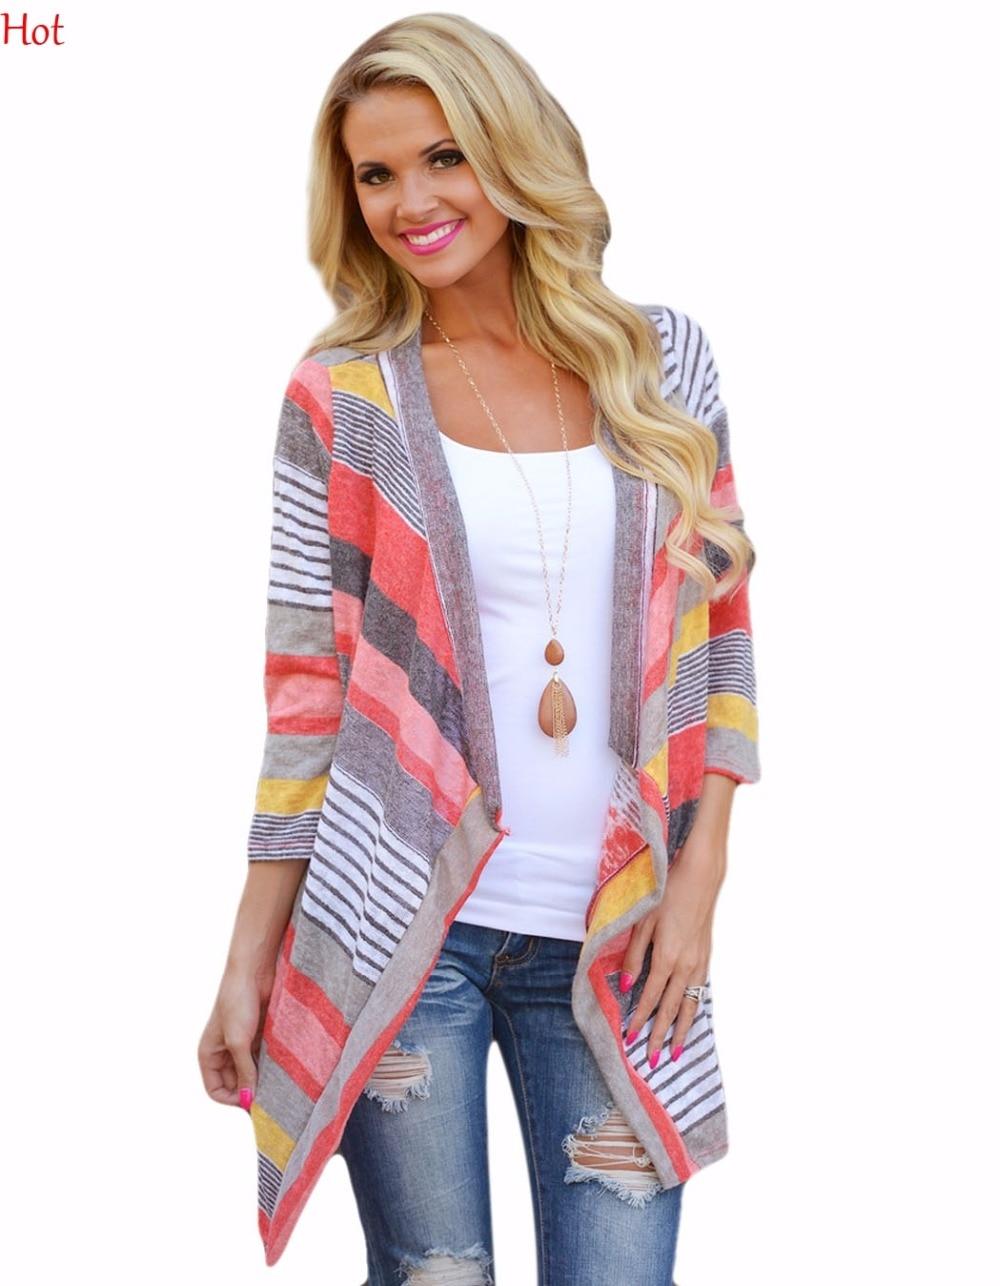 Ladies Women Stripe Sweater Knitted Blosue Cardigan 3/4 Sleeve Irregular Bluse Asymmetric Casual Thin Cardigan Outwear SV028362